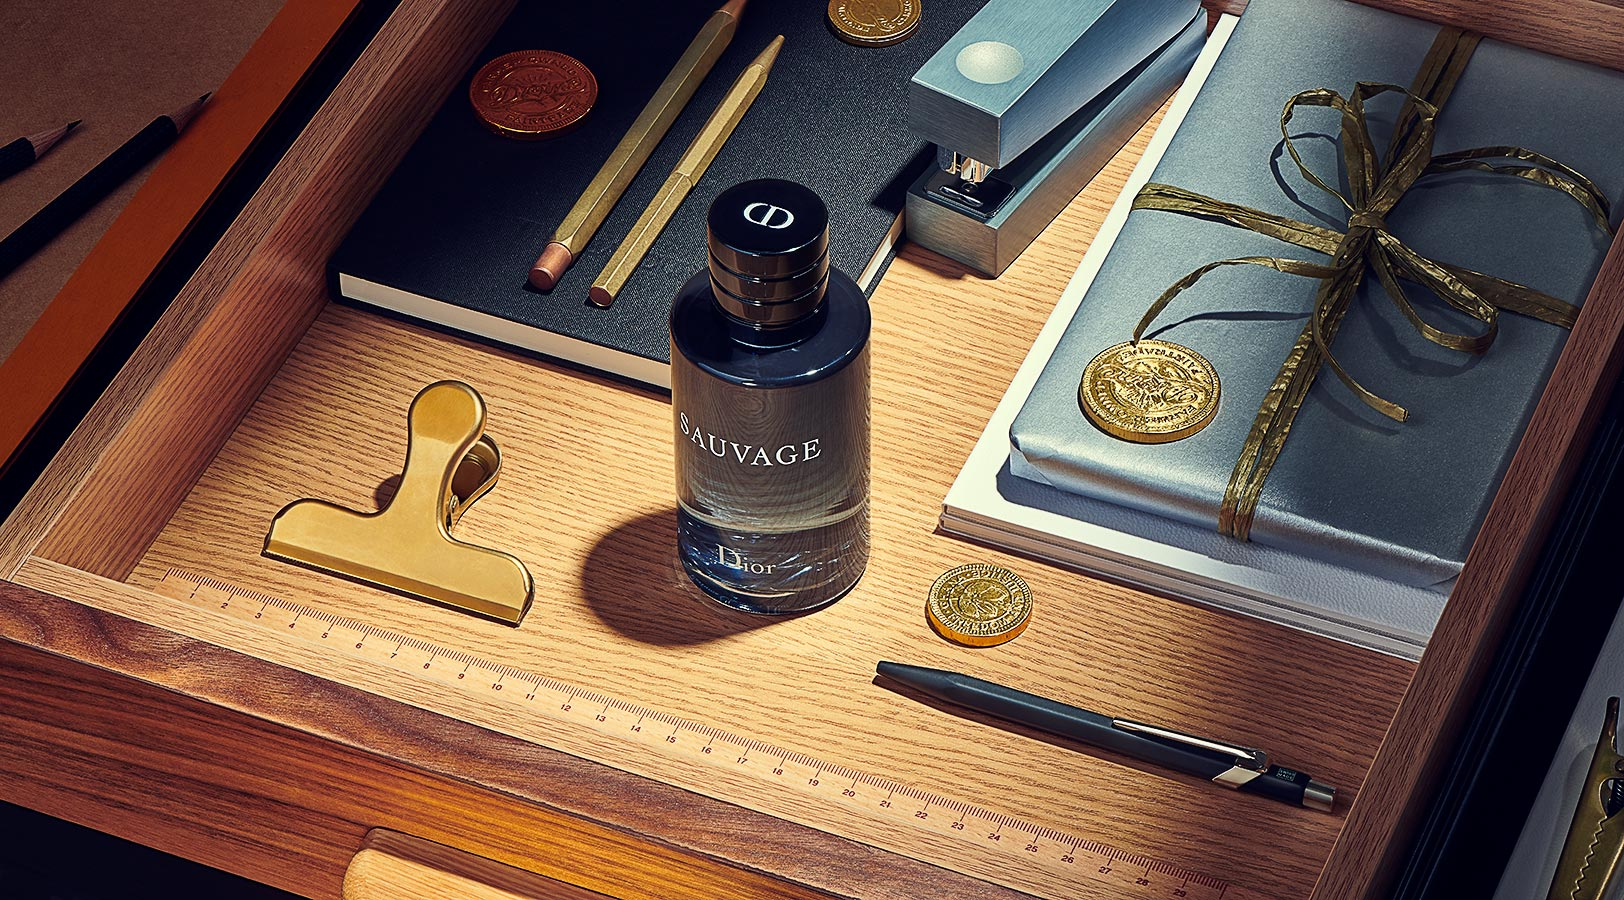 Esquire_Dior-sauvage-final-web.jpg